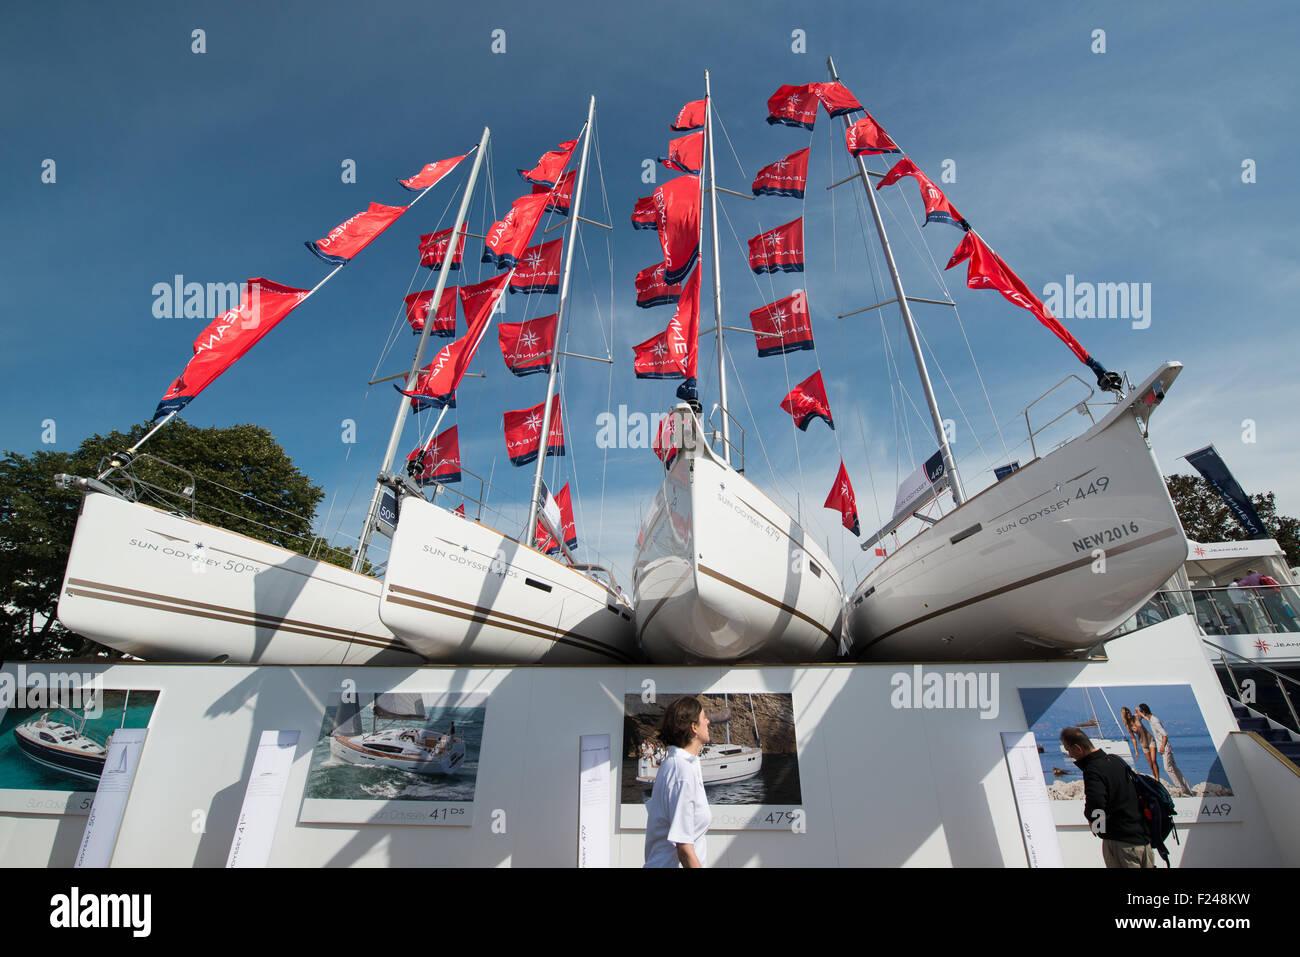 Southampton, UK. 11th September 2015. Southampton Boat Show 2015. Visitors walk past 4 Jeanneau yachts on display Stock Photo